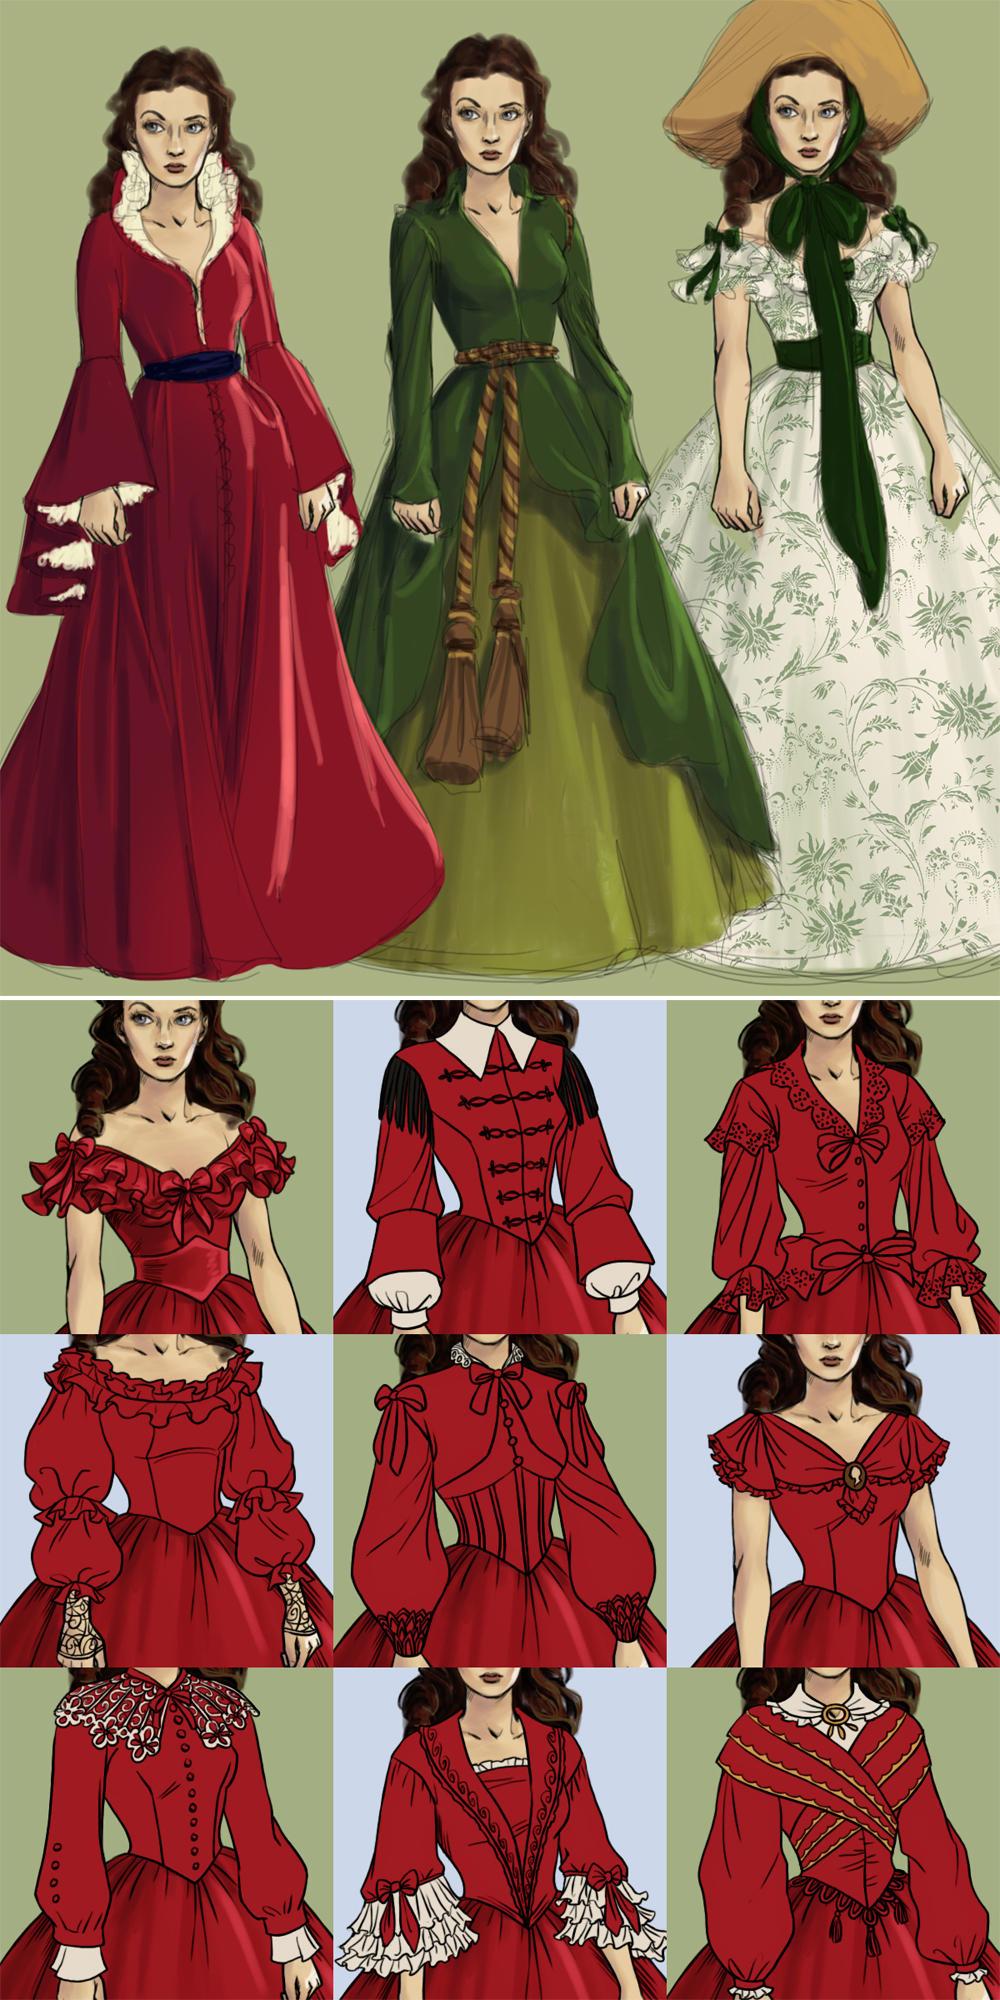 Next dress up game game: Southern Belle by AzaleasDolls